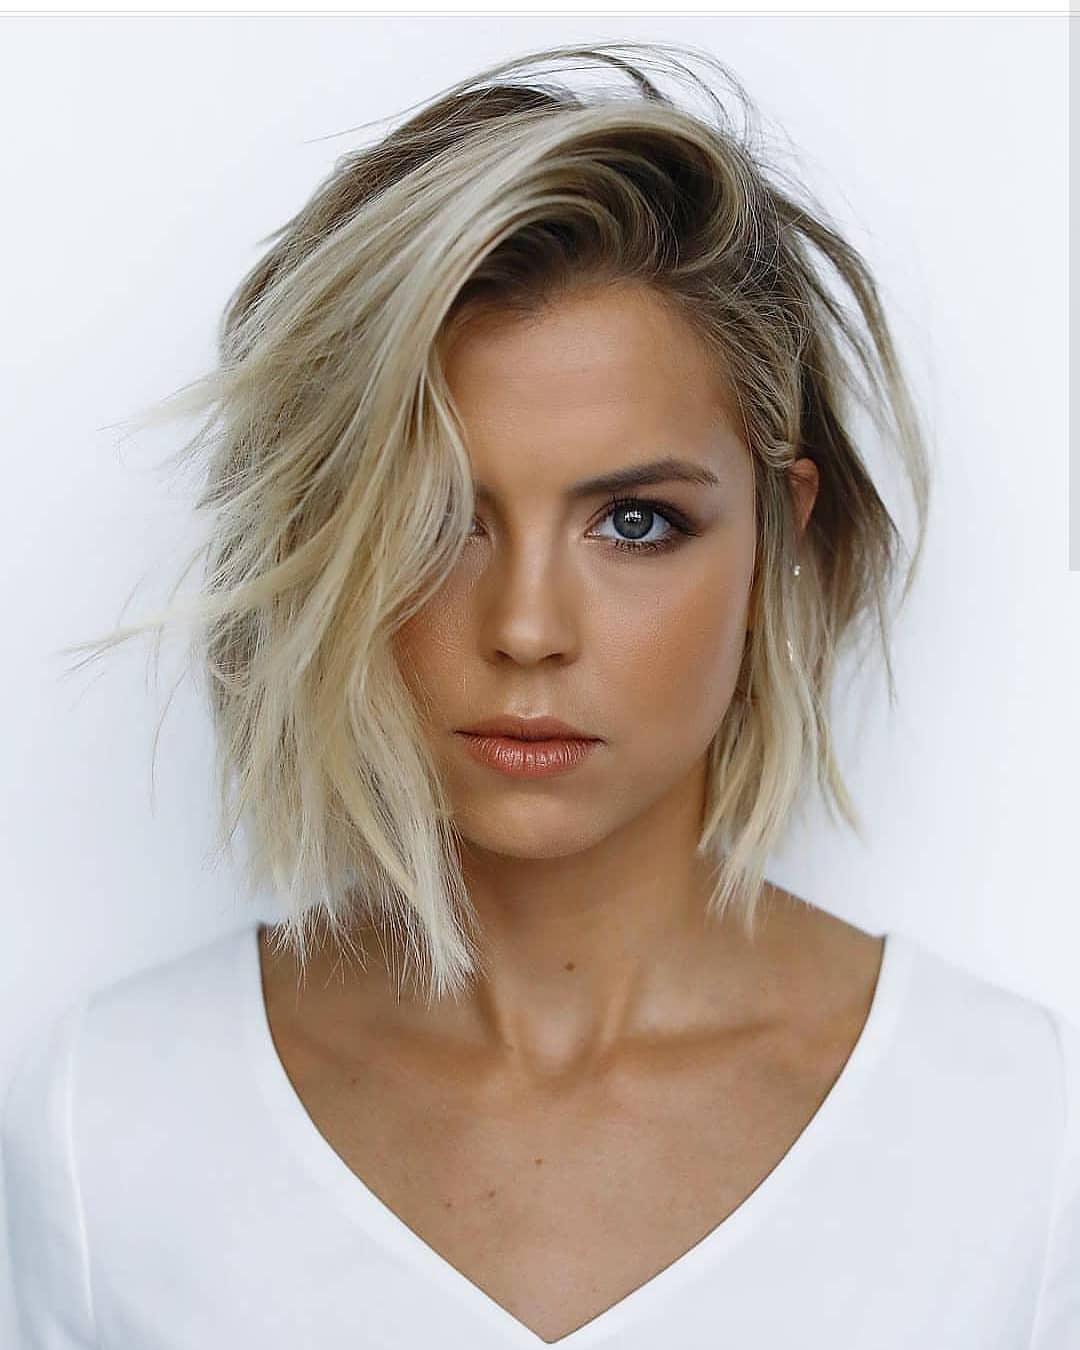 Casual Short Hairstyles - Modern Short Haircut Ideas for Women